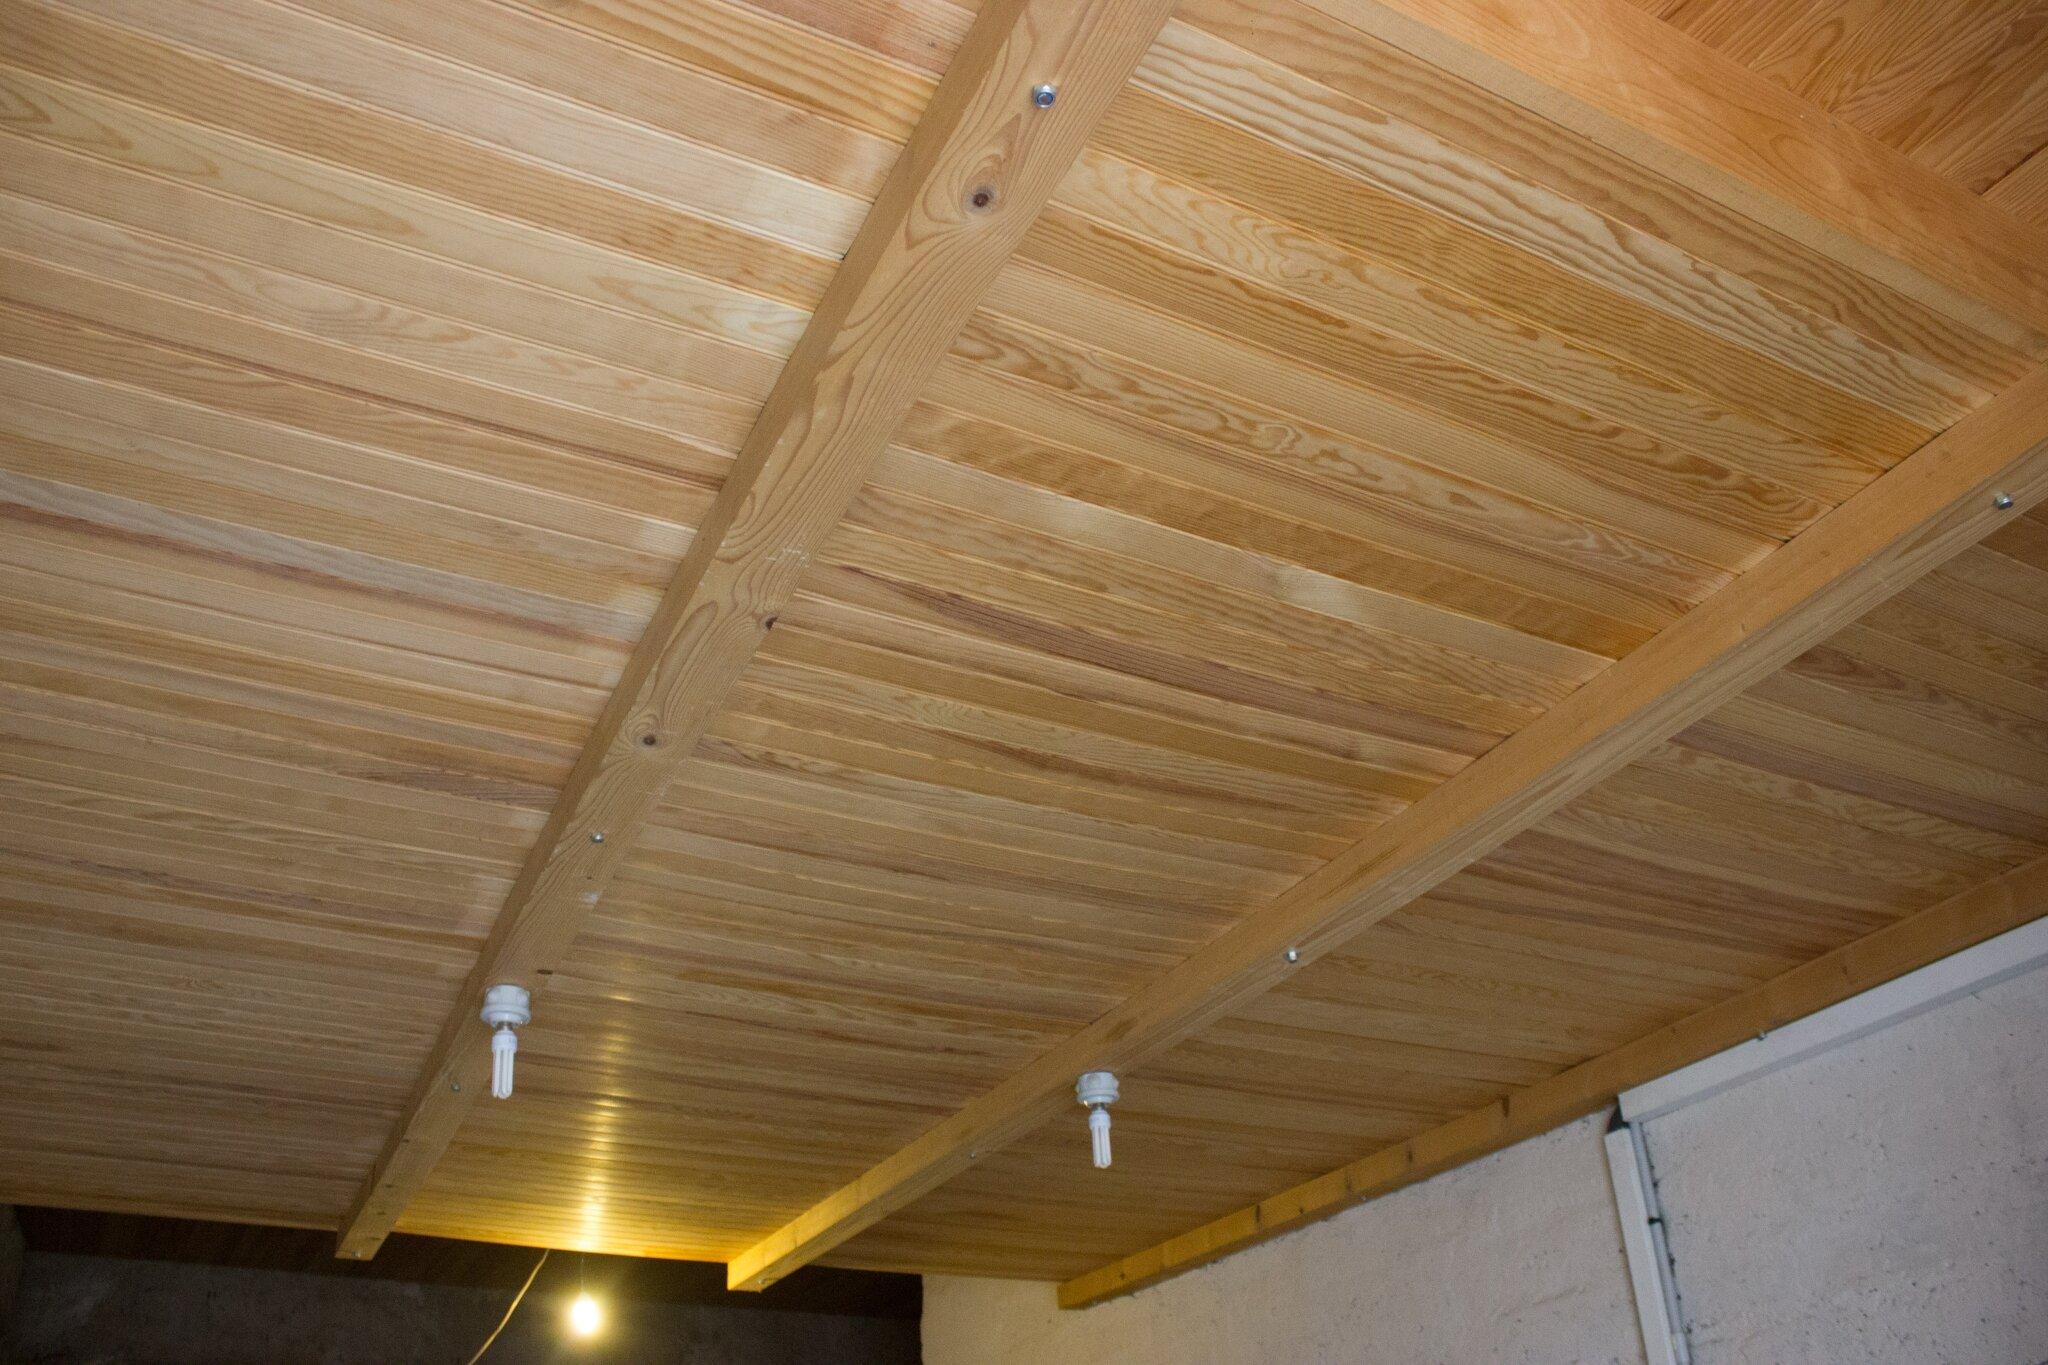 isolation plafond garage isolant plafond garage construire un bureau de jardin cologique. Black Bedroom Furniture Sets. Home Design Ideas